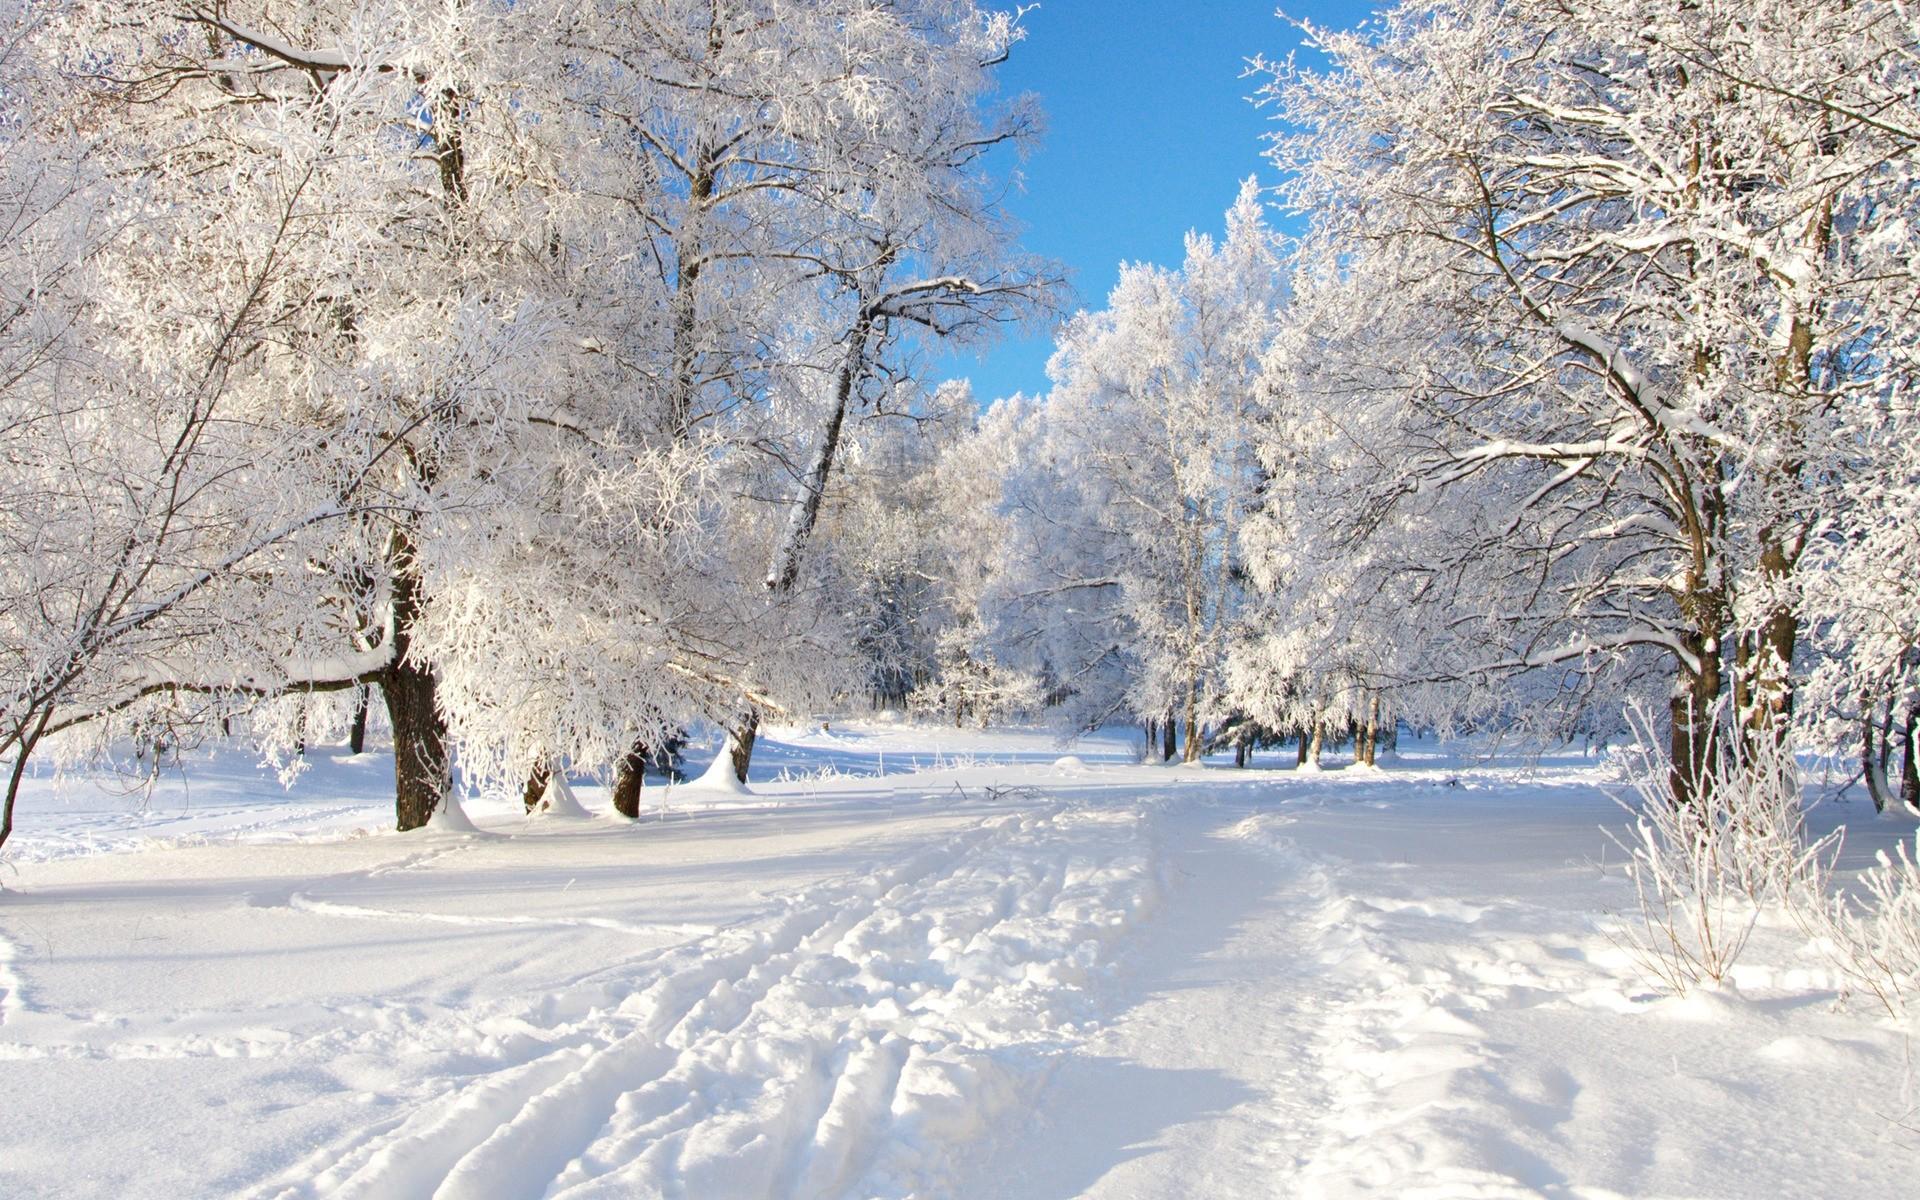 Winter Scenic Wallpaper 60 Images